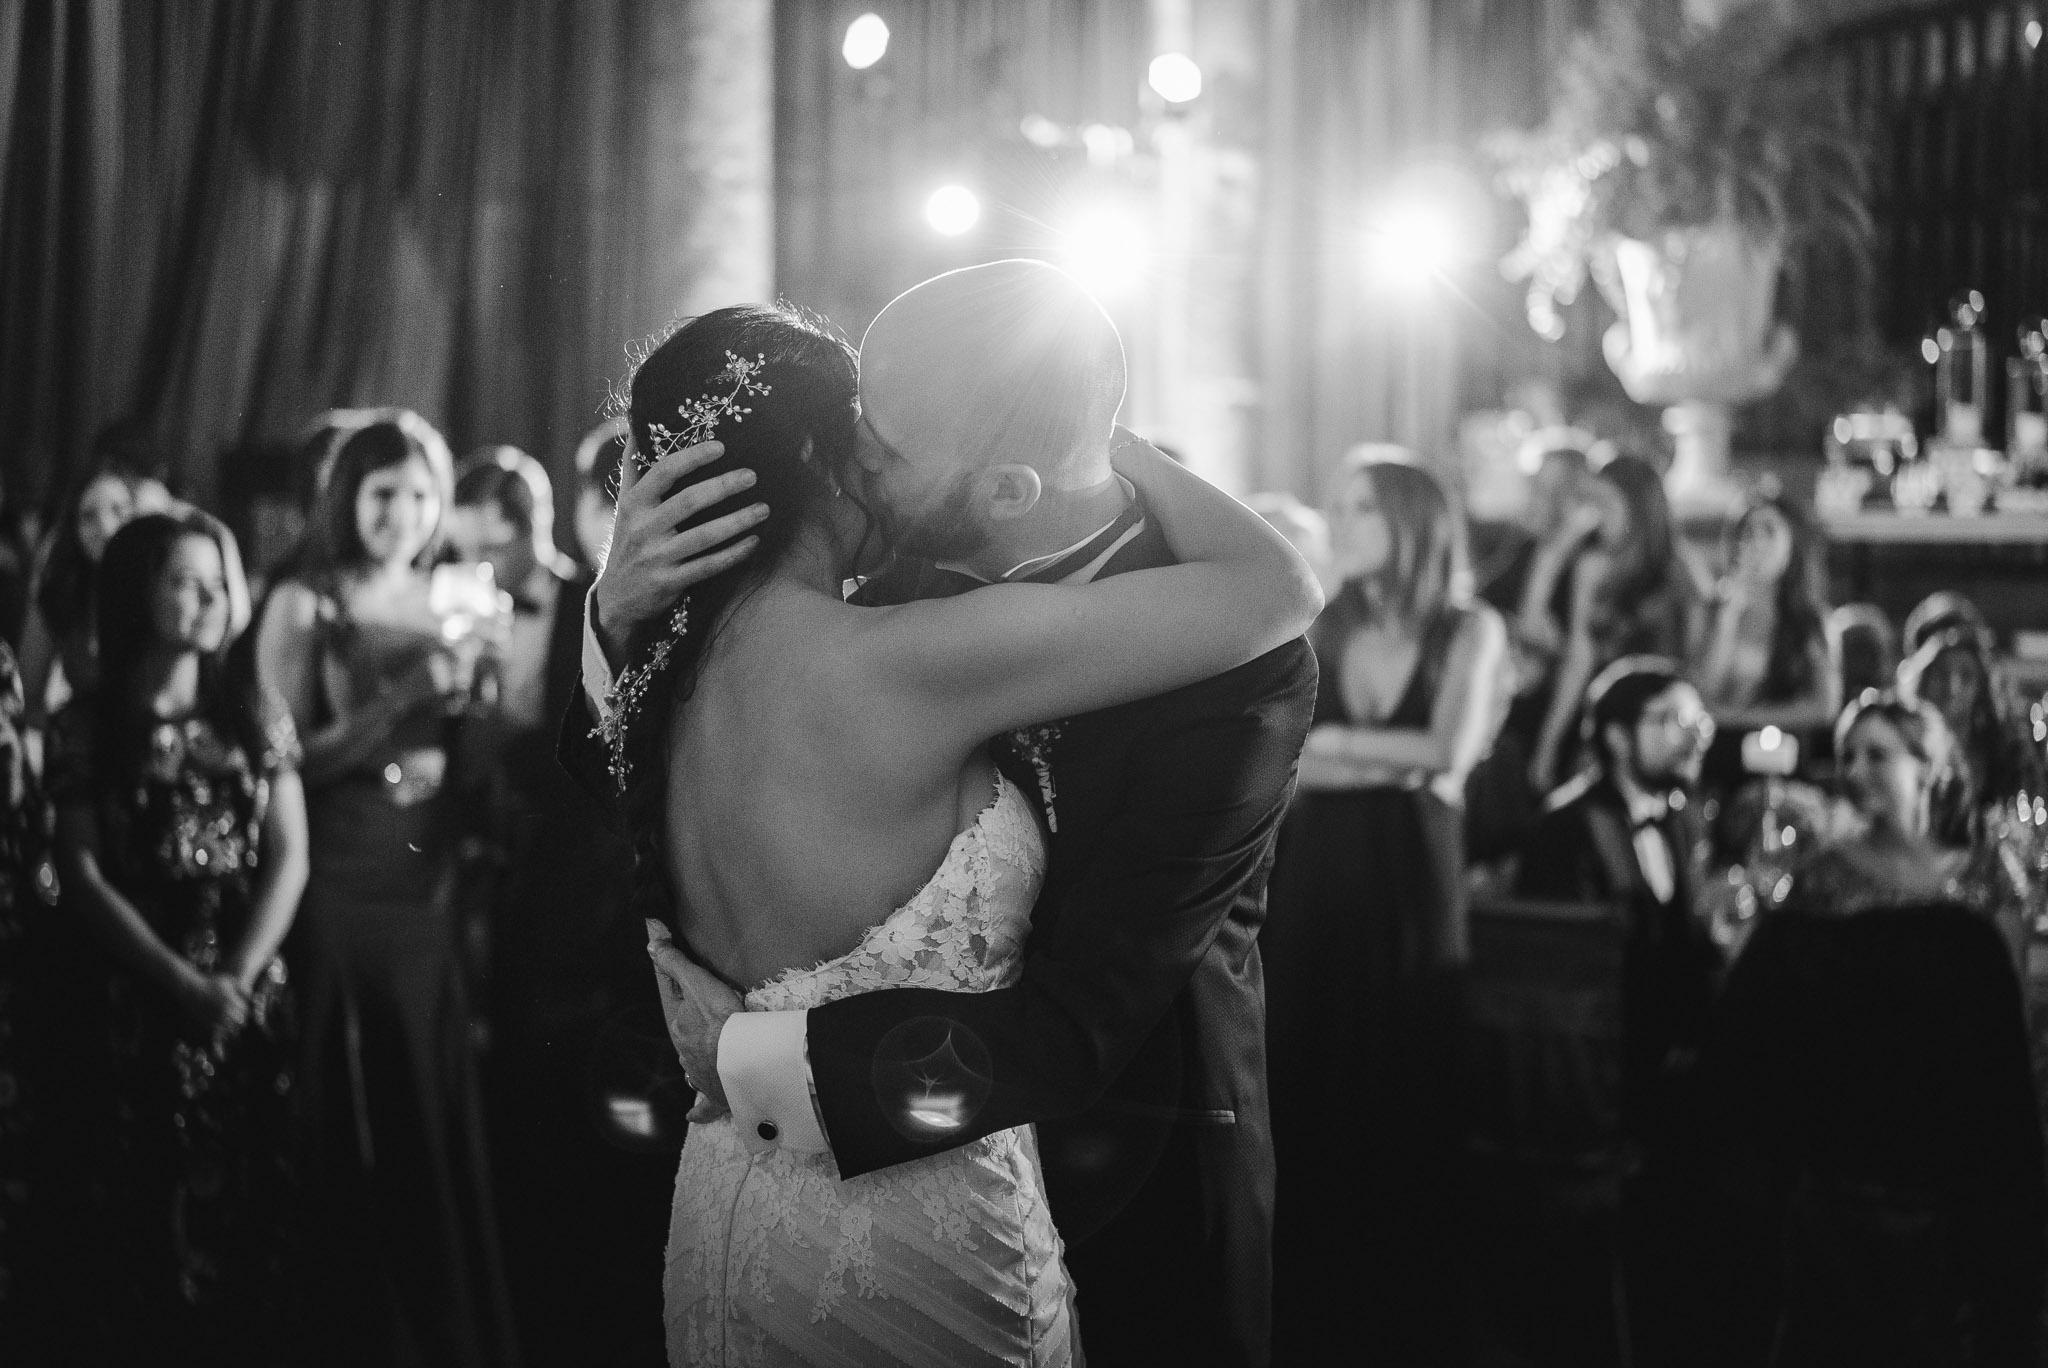 ©www.mauriziosolisbroca.com-20161002maurizio-solis-broca-mexico-canada-wedding-photographer20161002DSC08347-Edit.jpg